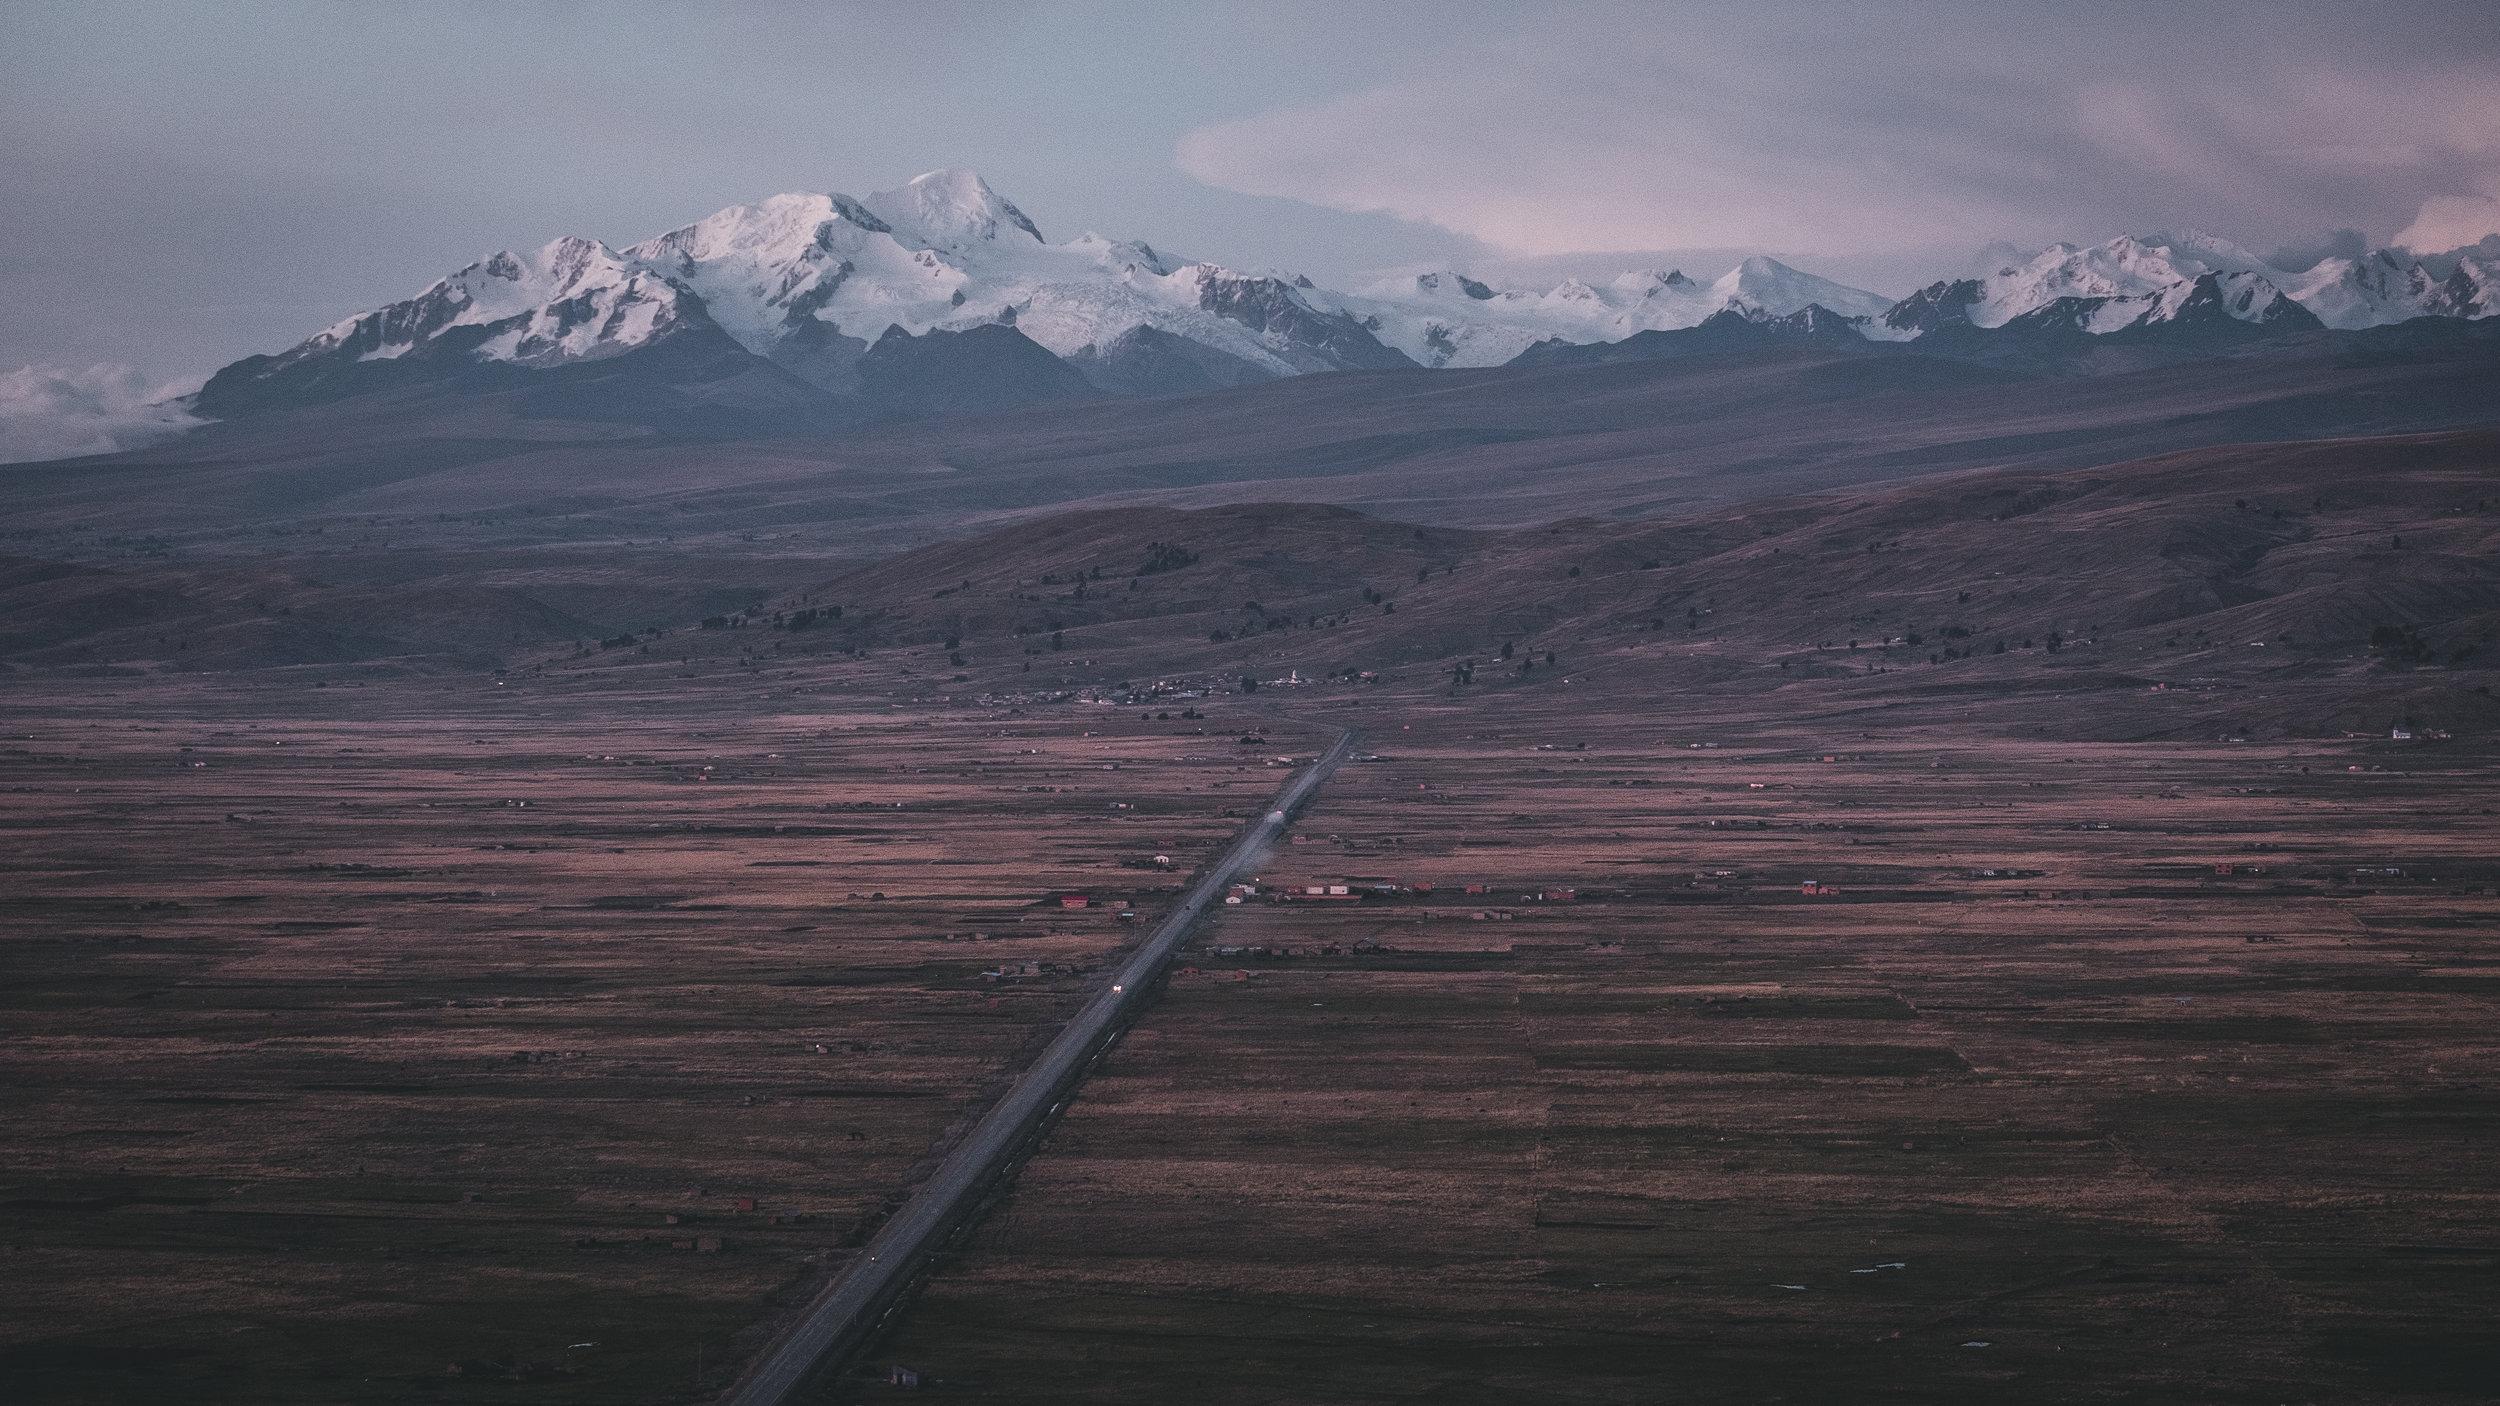 Road towards the mountains | La Paz